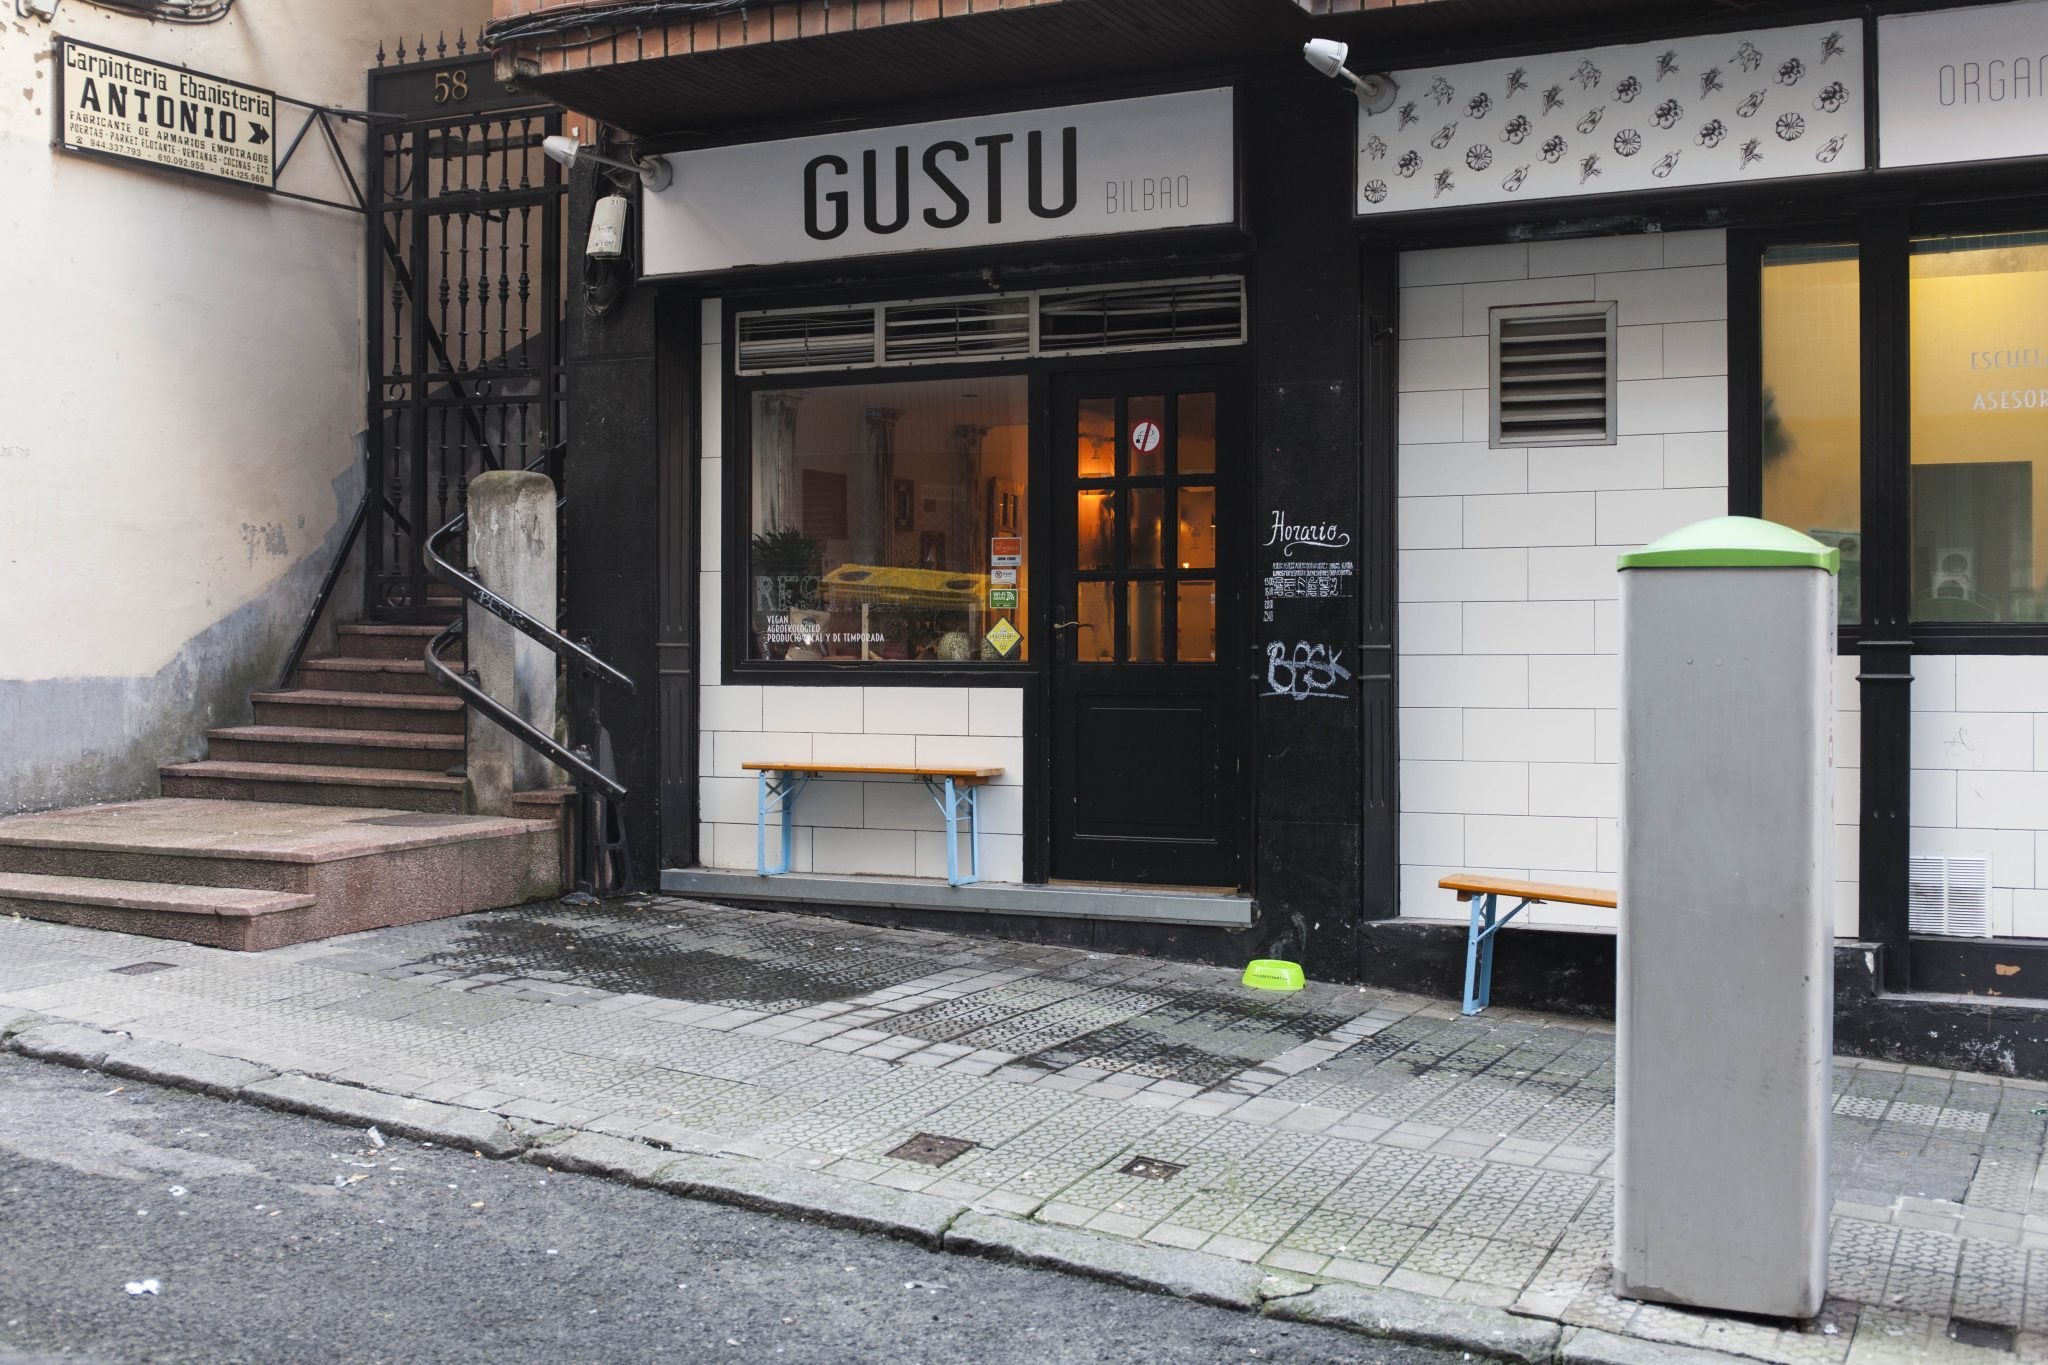 Gustu_1